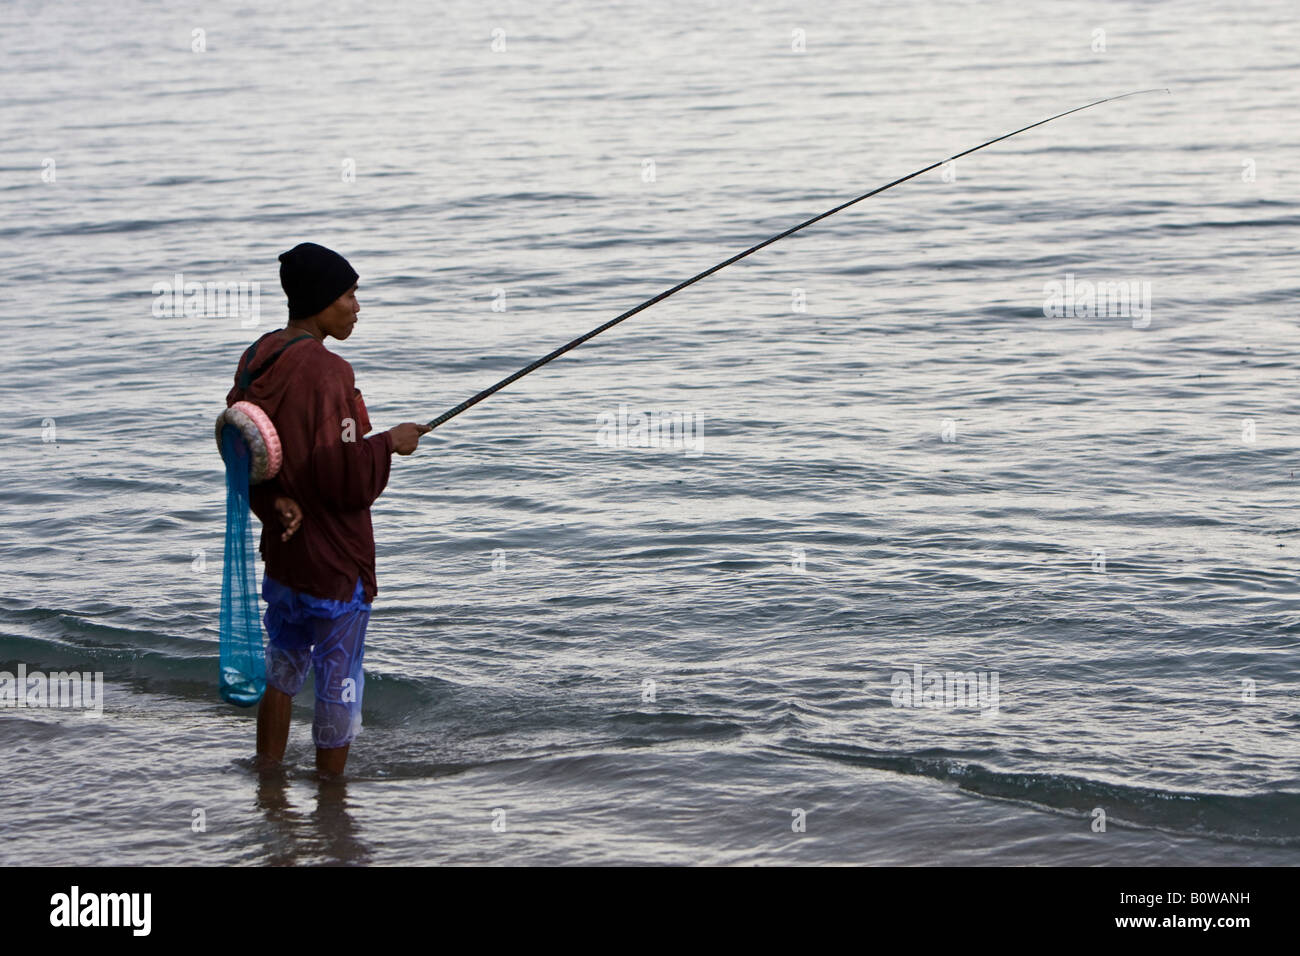 Fisherman fishing in the rain on the shore of Lombok Island